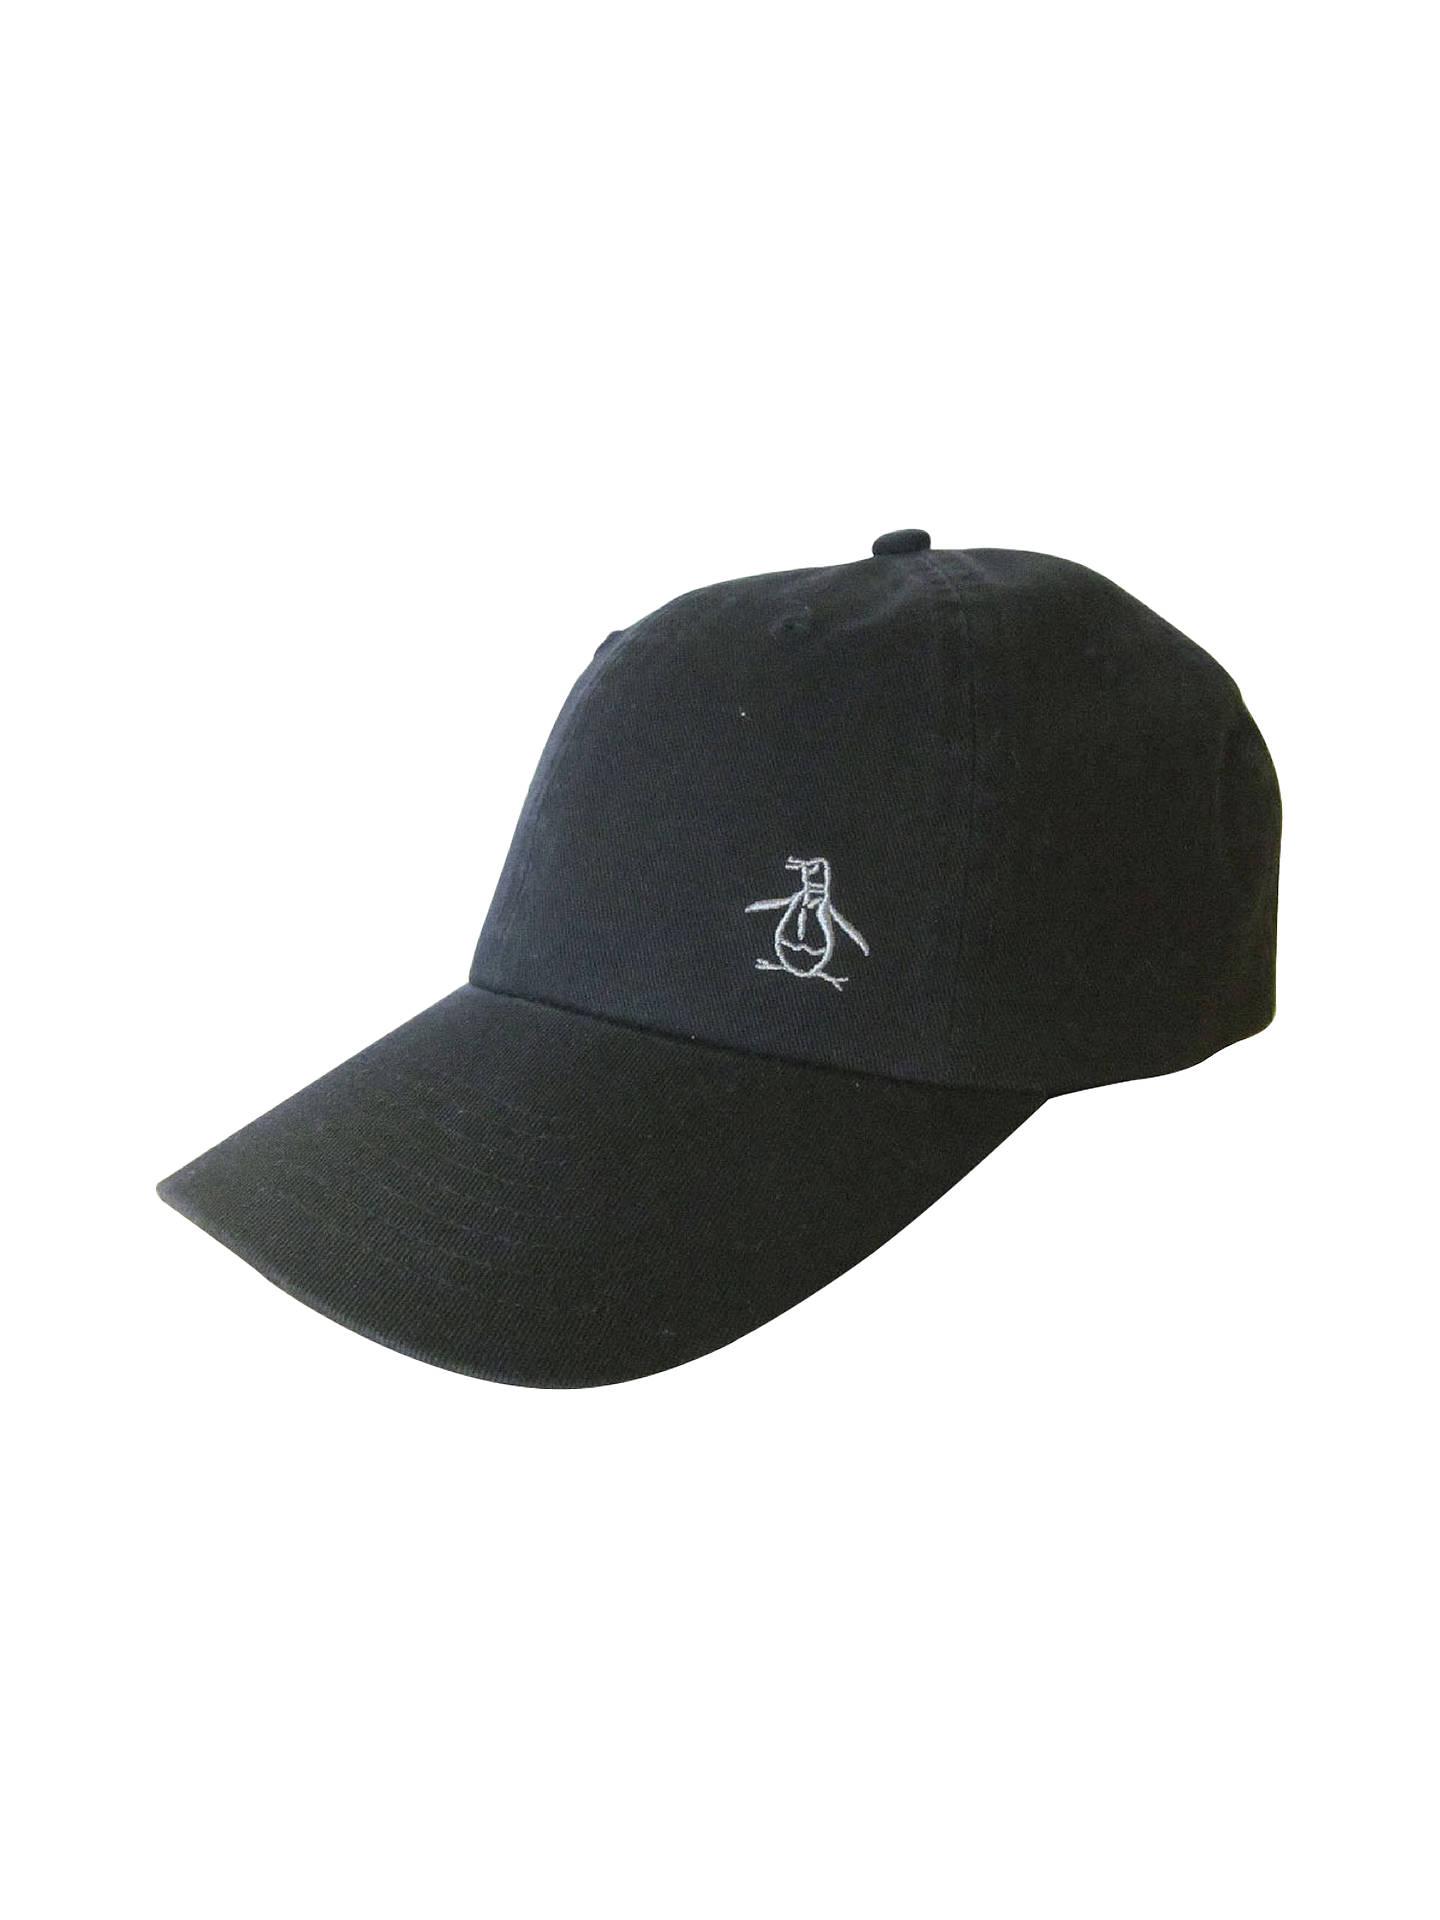 BuyOriginal Penguin Cotton Twill Baseball Cap ed23f04d5dcf